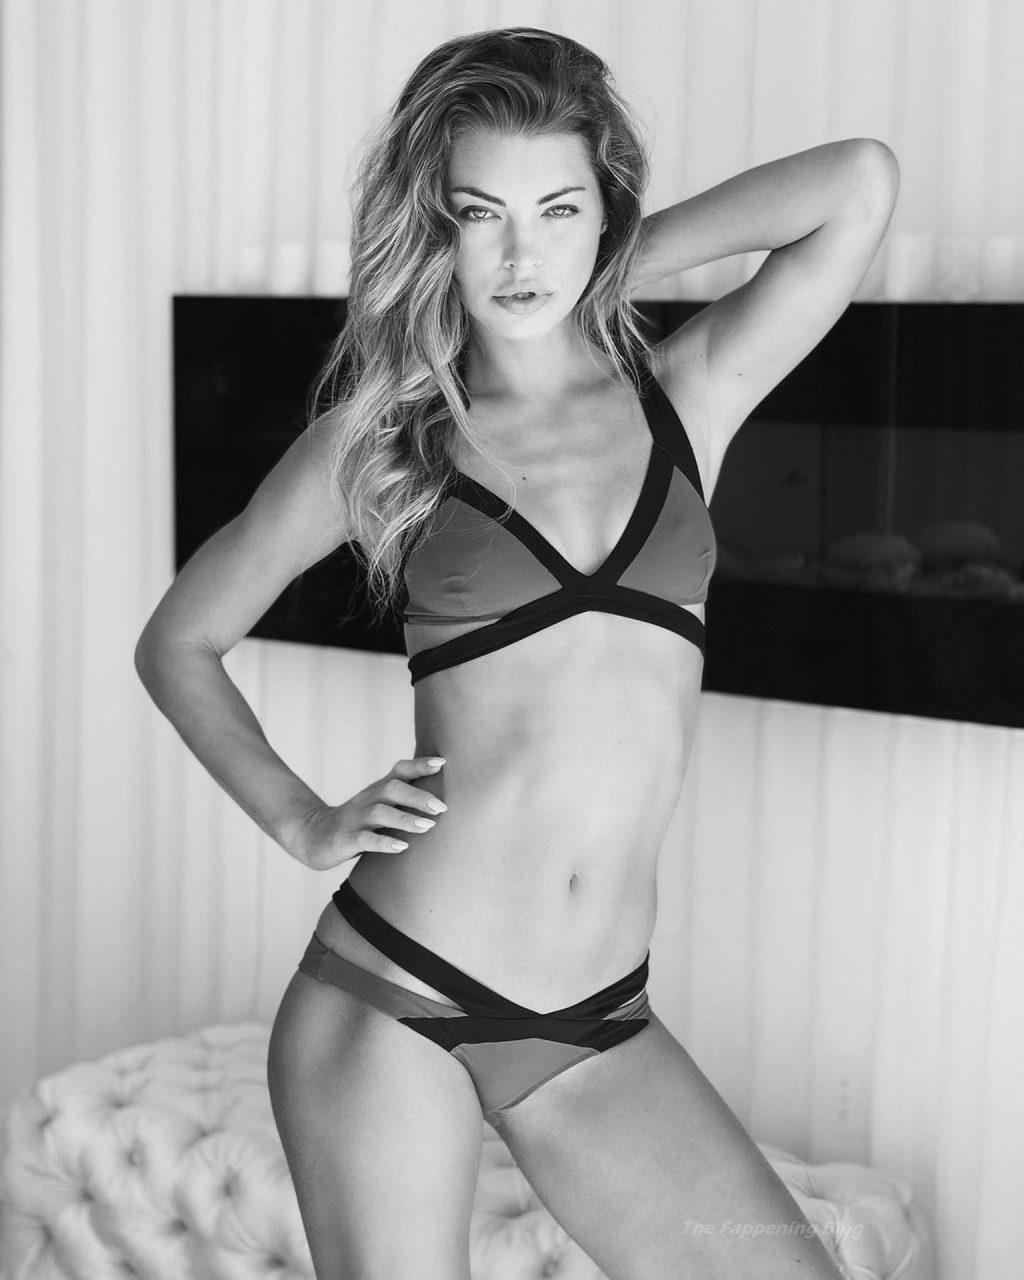 Anastasia Grik Sunbathes in Sunny Miami (23 Photos)